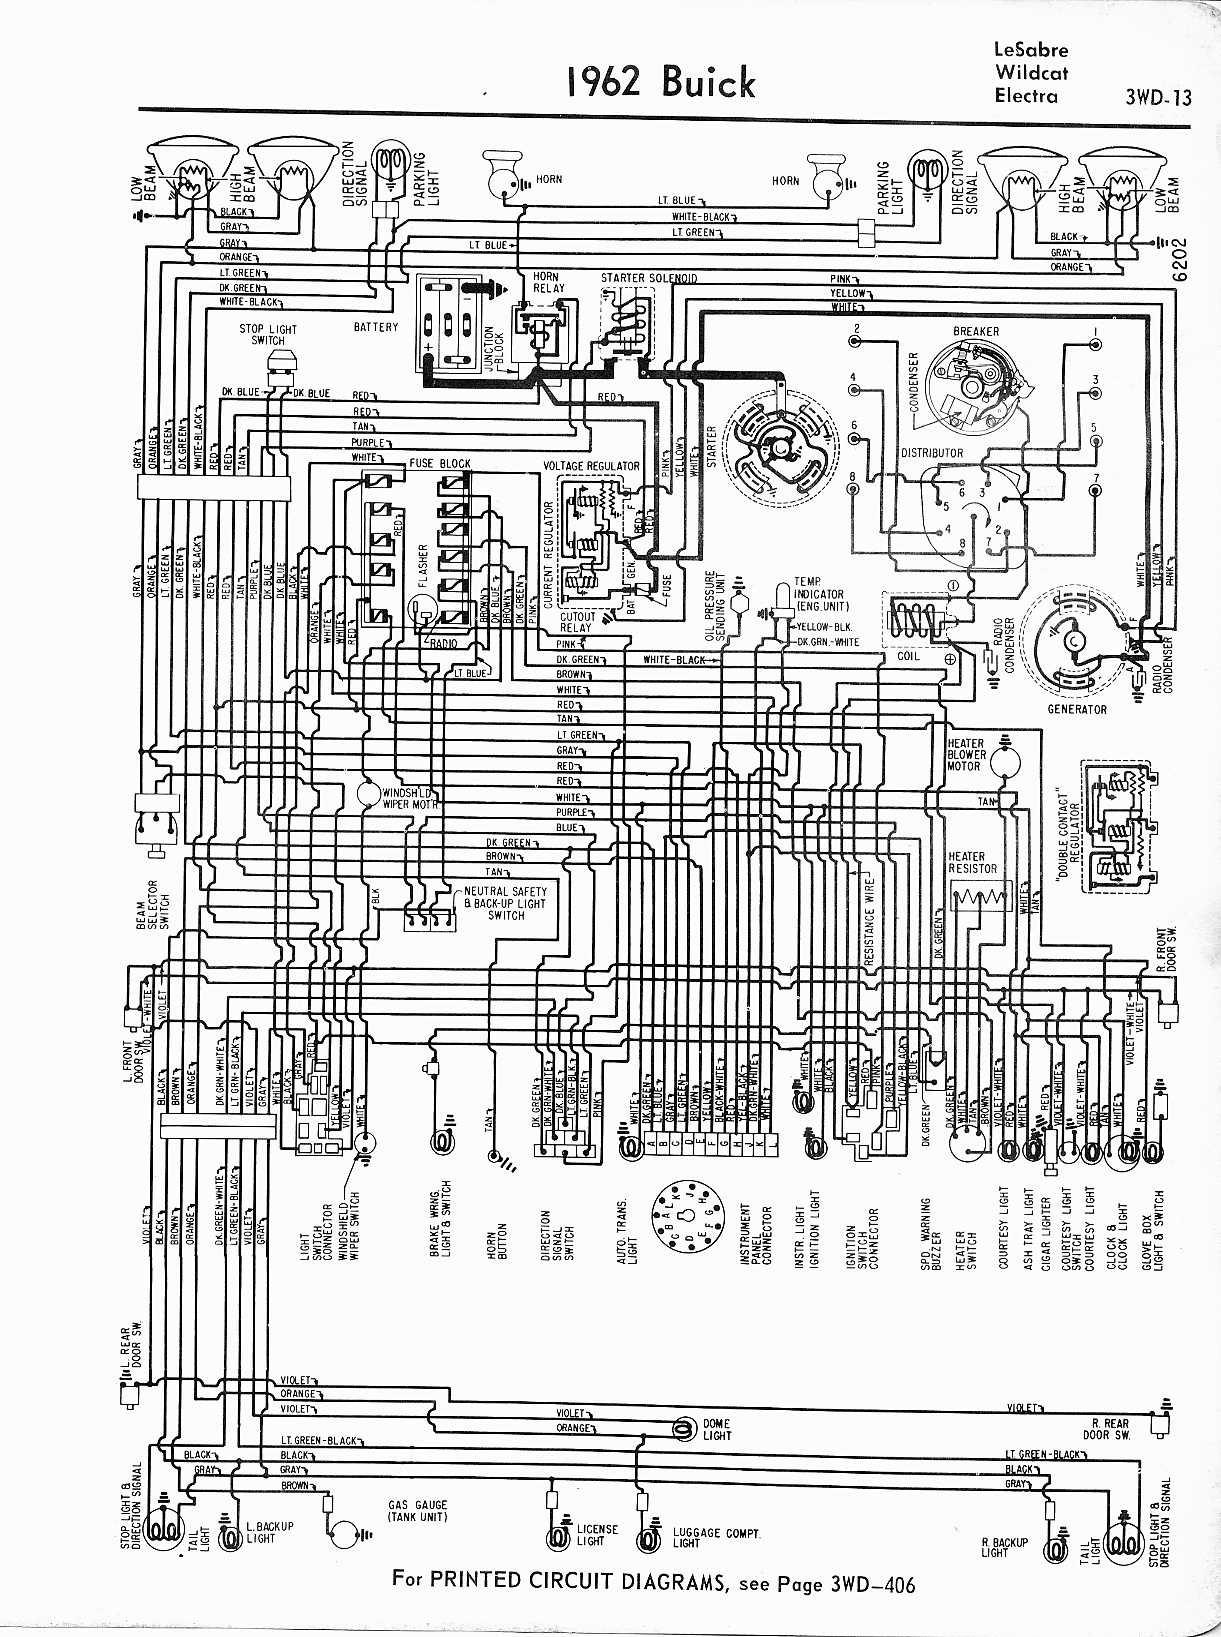 1967 Buick Skylark Fuse Box Diagram - wiring diagram crew-started-a -  crew-started-a.miceincampania.it [ 1637 x 1221 Pixel ]